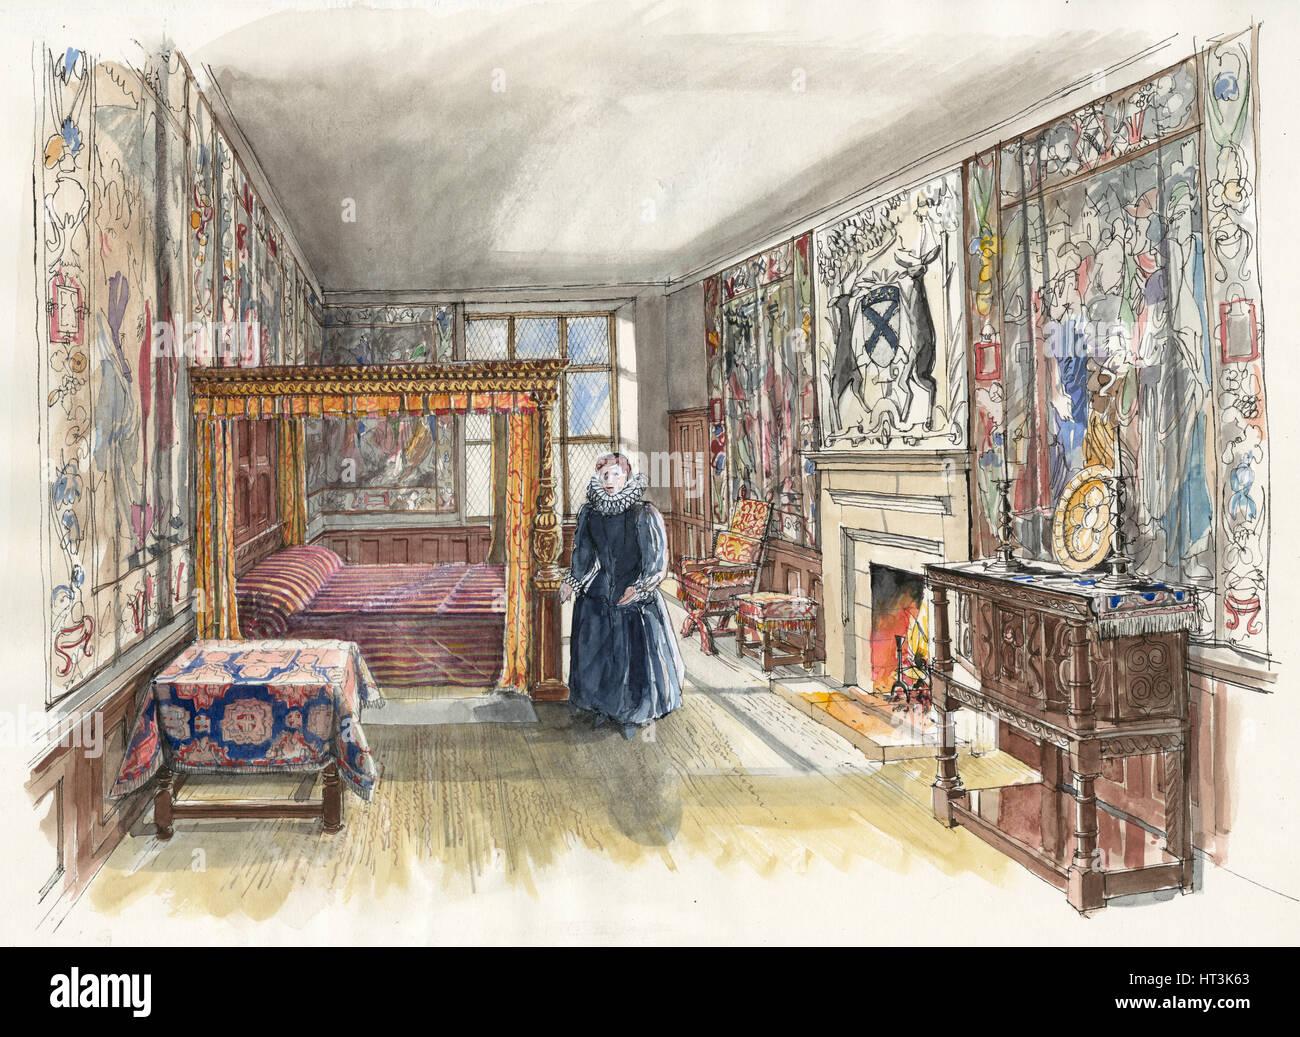 Hardwick Old Hall, 1601, (c2000-2010).  Artist: Liam Wales. - Stock Image